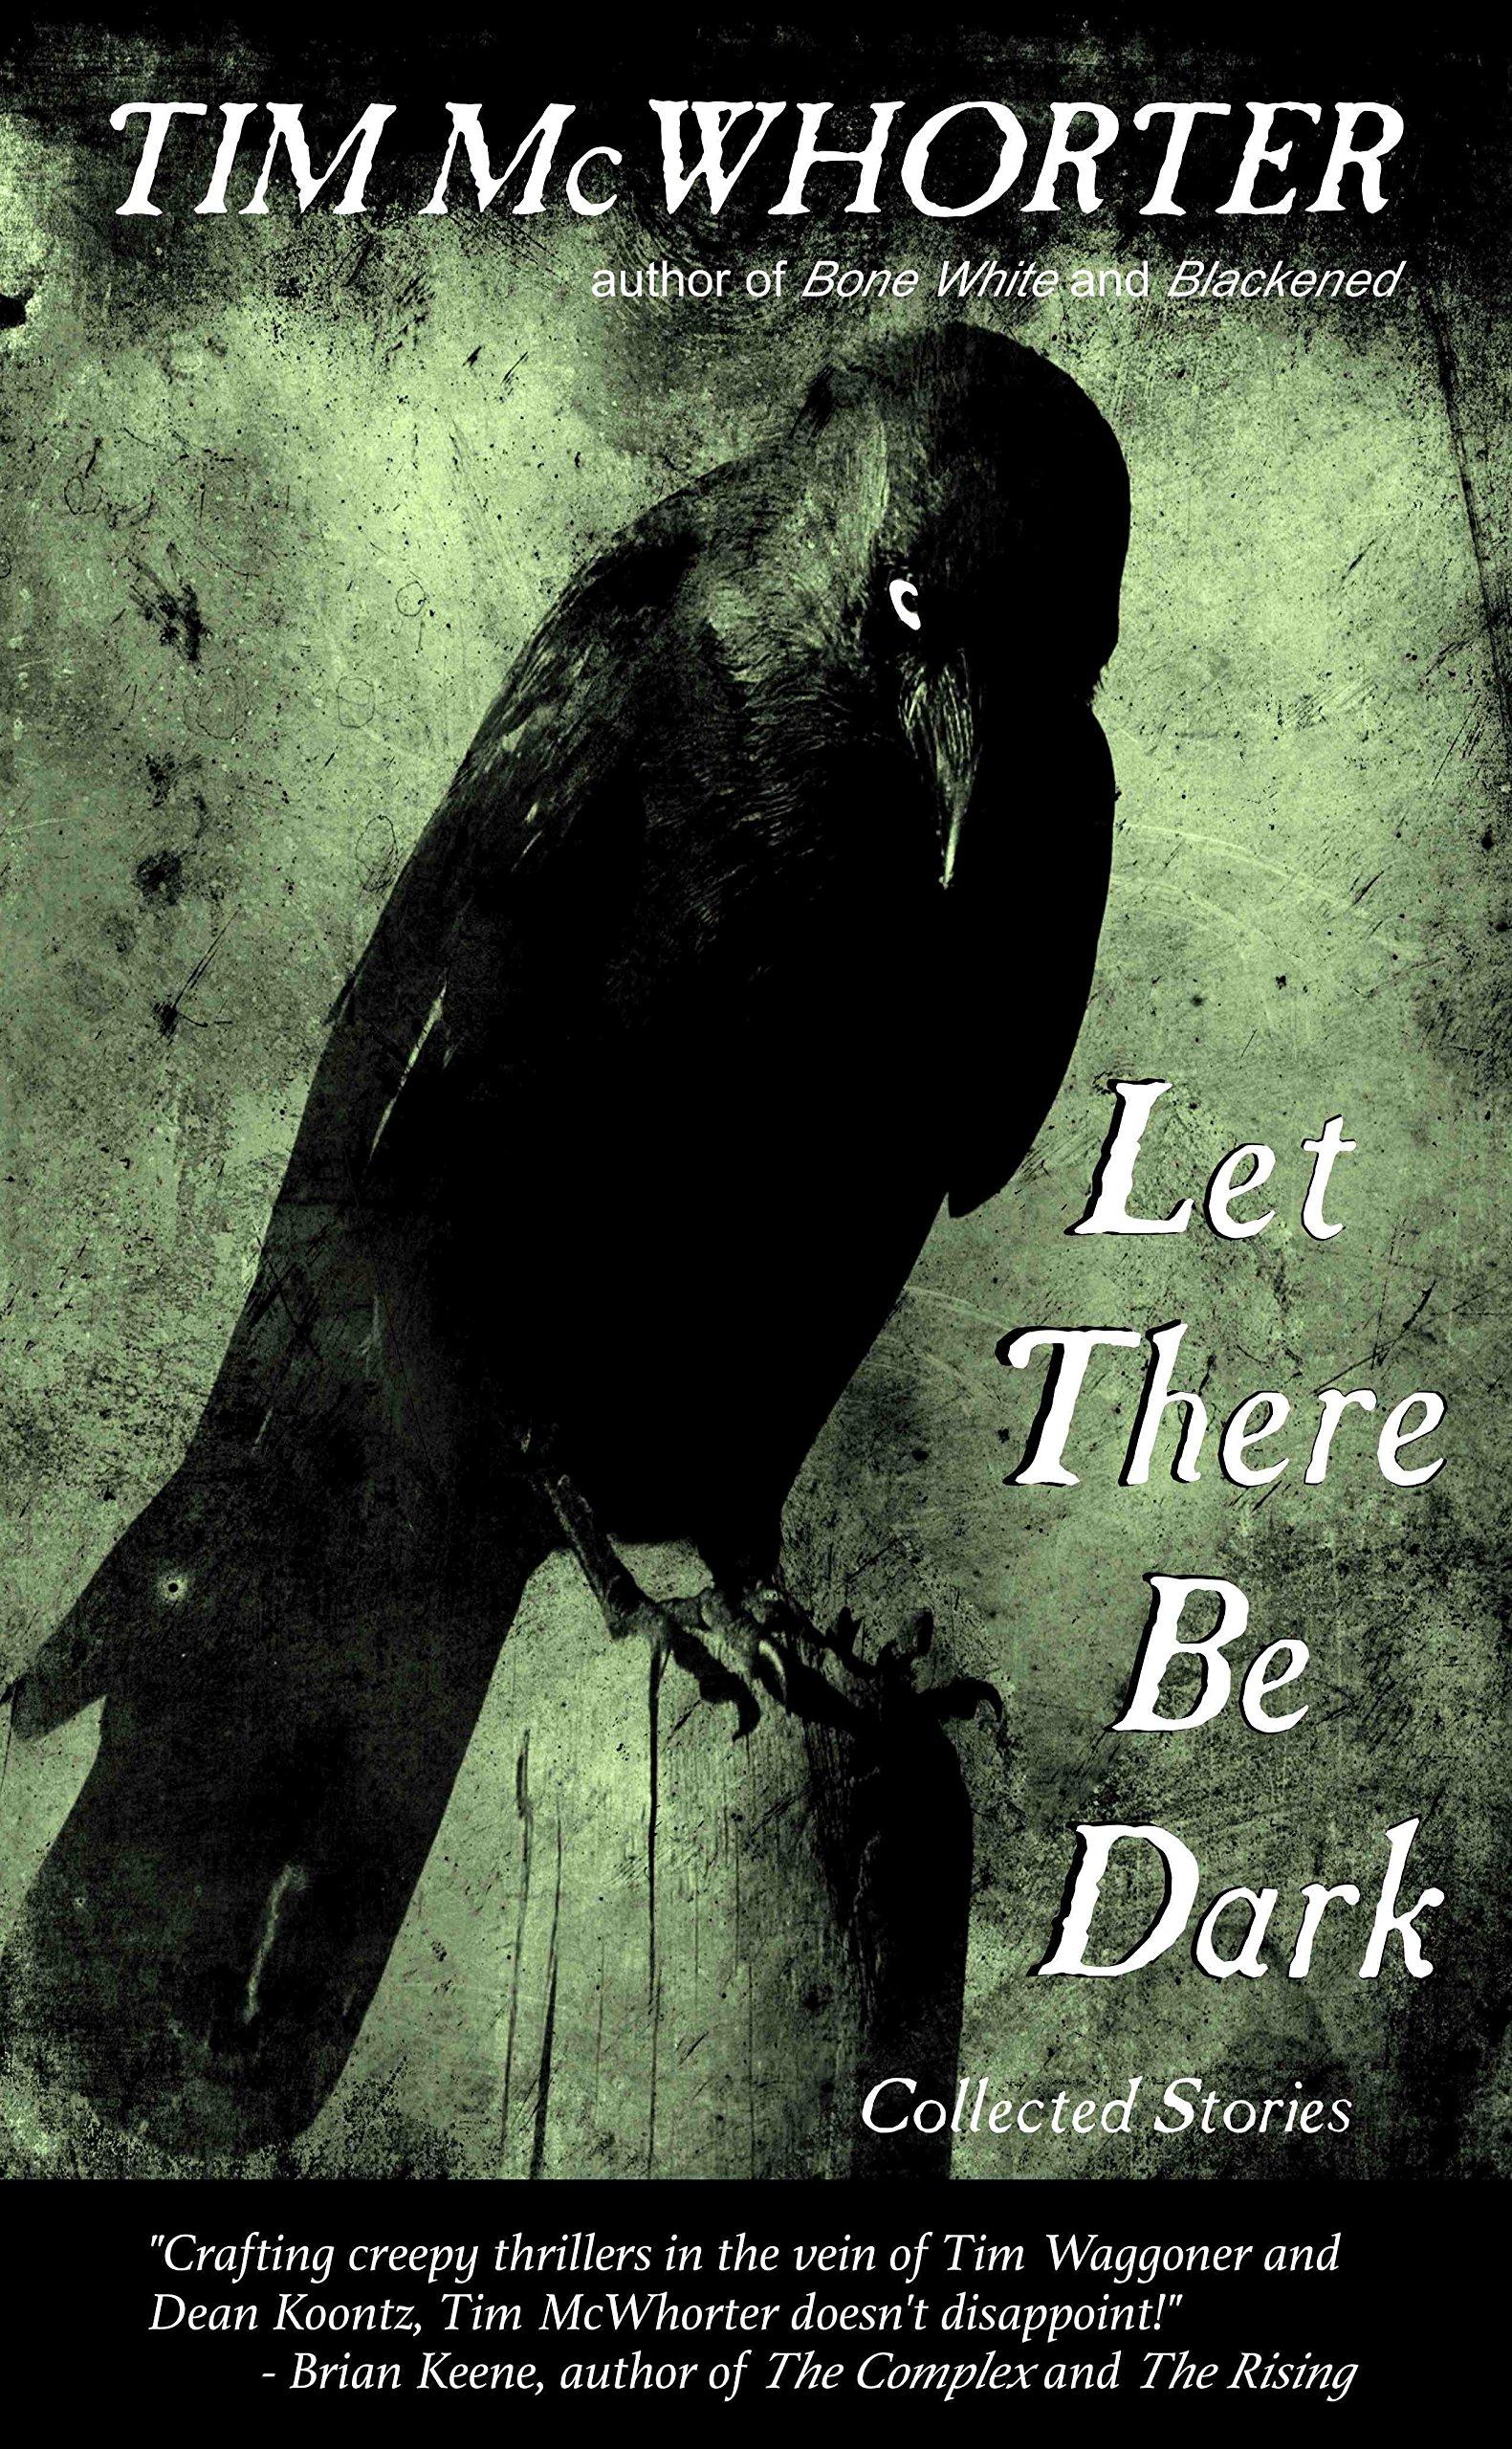 Let There Be Dark_Tim McWhorter.jpg